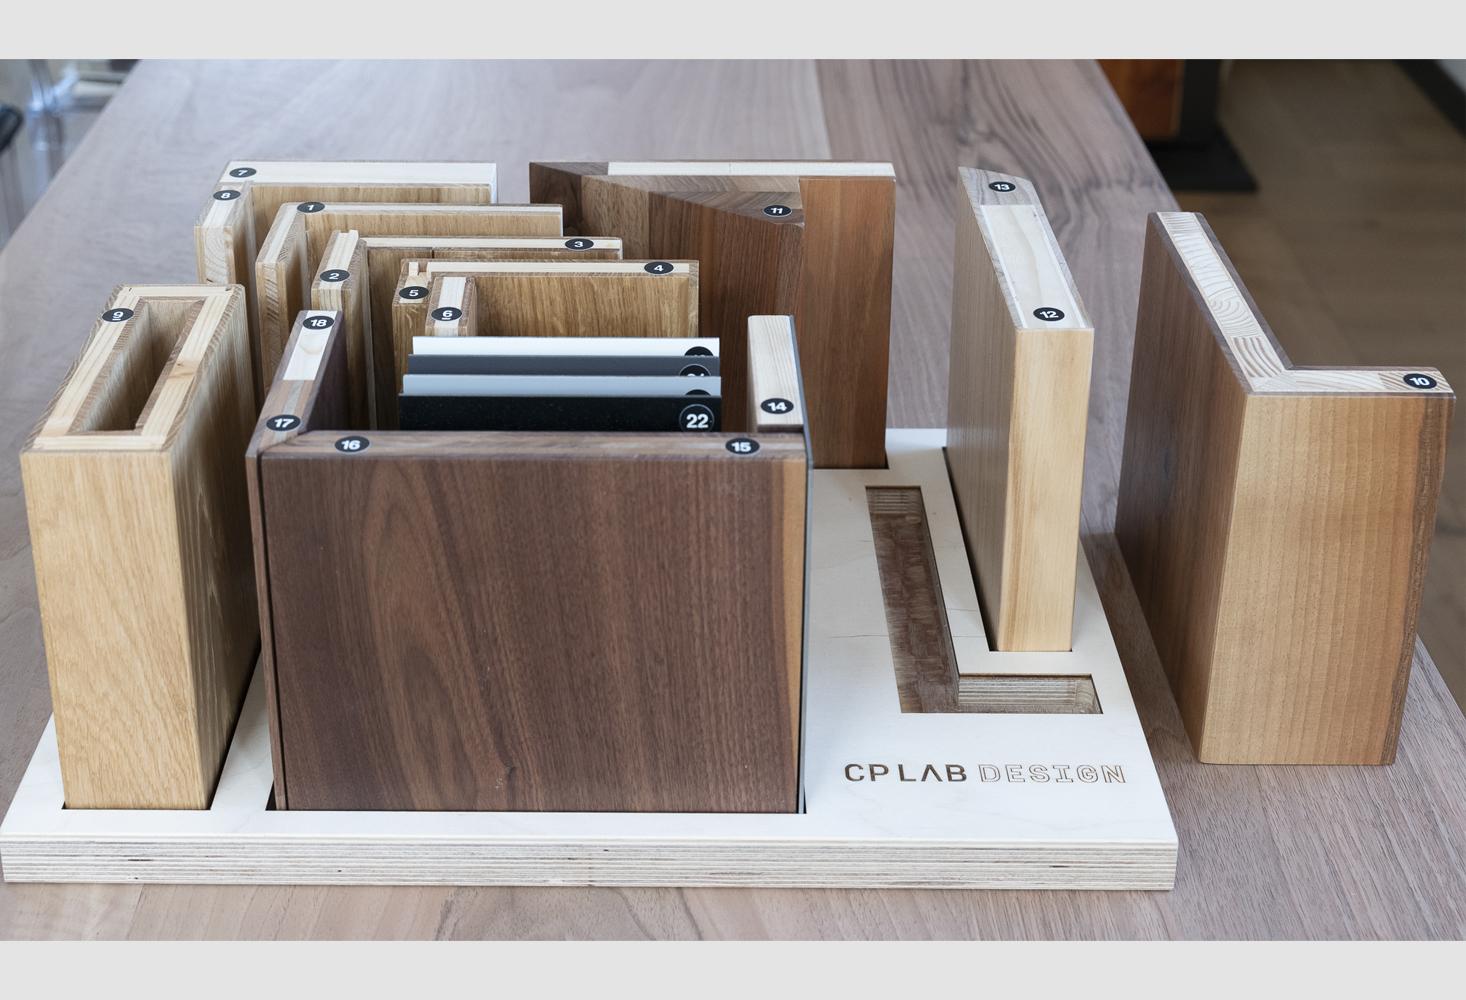 Sample forme CP LAB Design